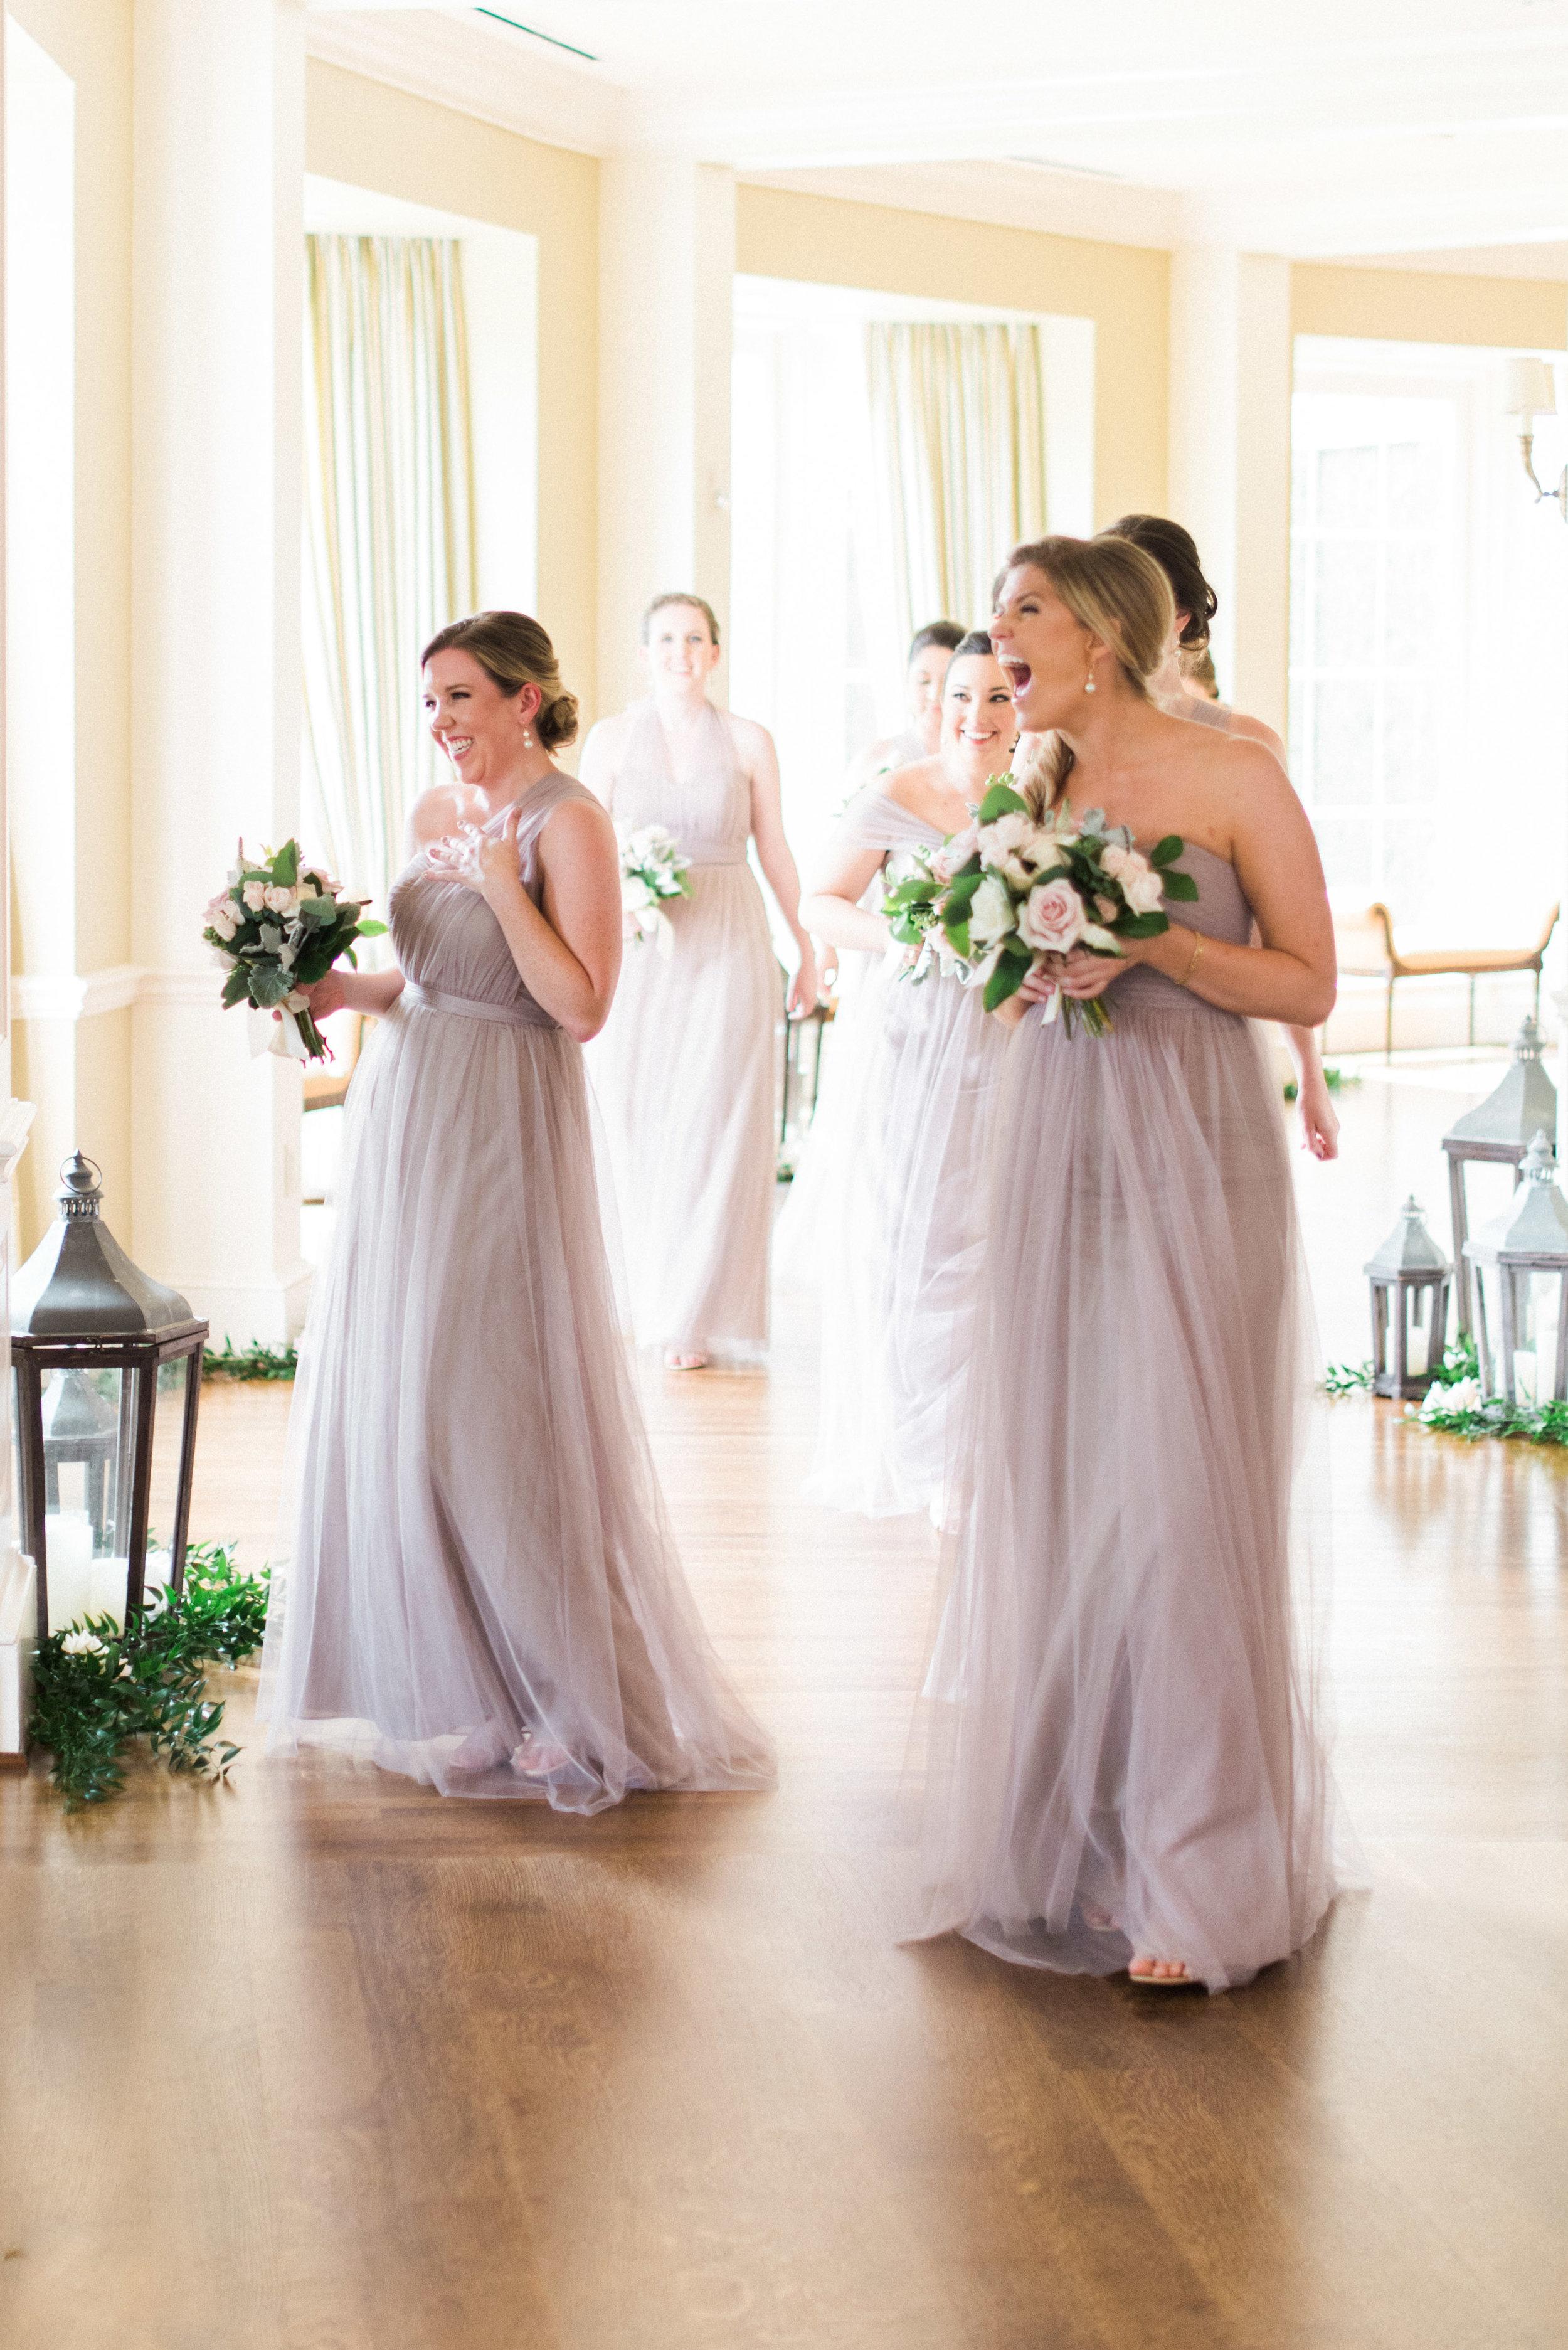 Fine-Art-Film-Houston-Wedding-Photographer-Best-Top-Luxury-Texas-Austin-Dallas-Destination-Dana-Fernandez-Photography-River-Oaks-Country-Club-South-Main-Baptist-Ceremony-Reception-Wedding-6.jpg